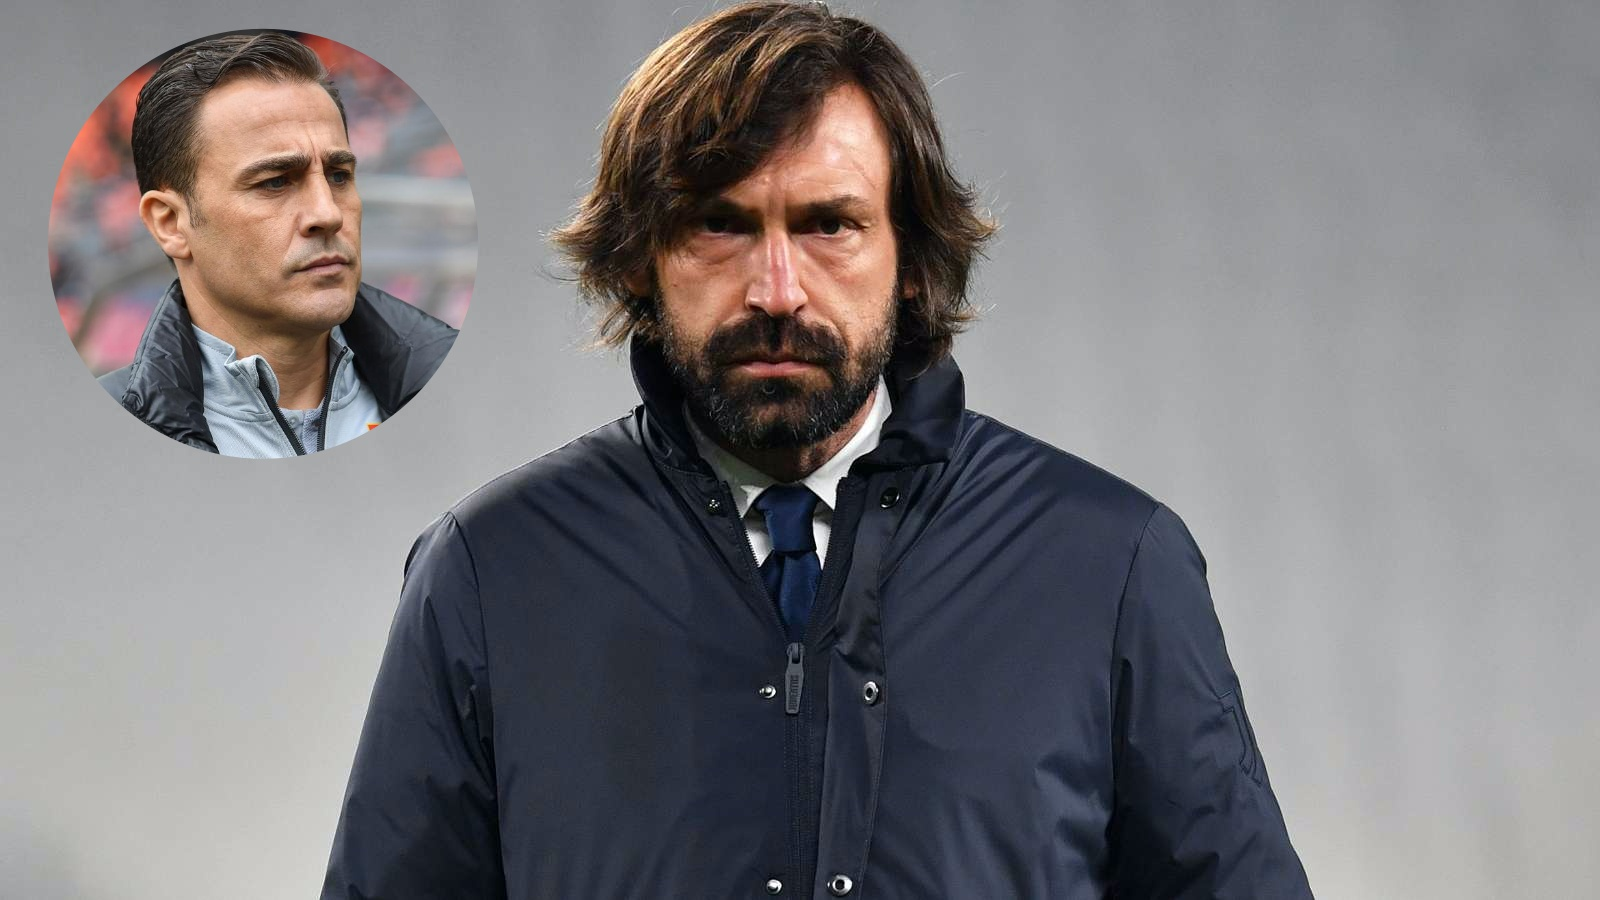 "Cannavaro nói về việc sa thải Pirlo, Juventus sẽ mắc ""sai lầm lần hai"" nếu thiếu sự kiên nhẫn"